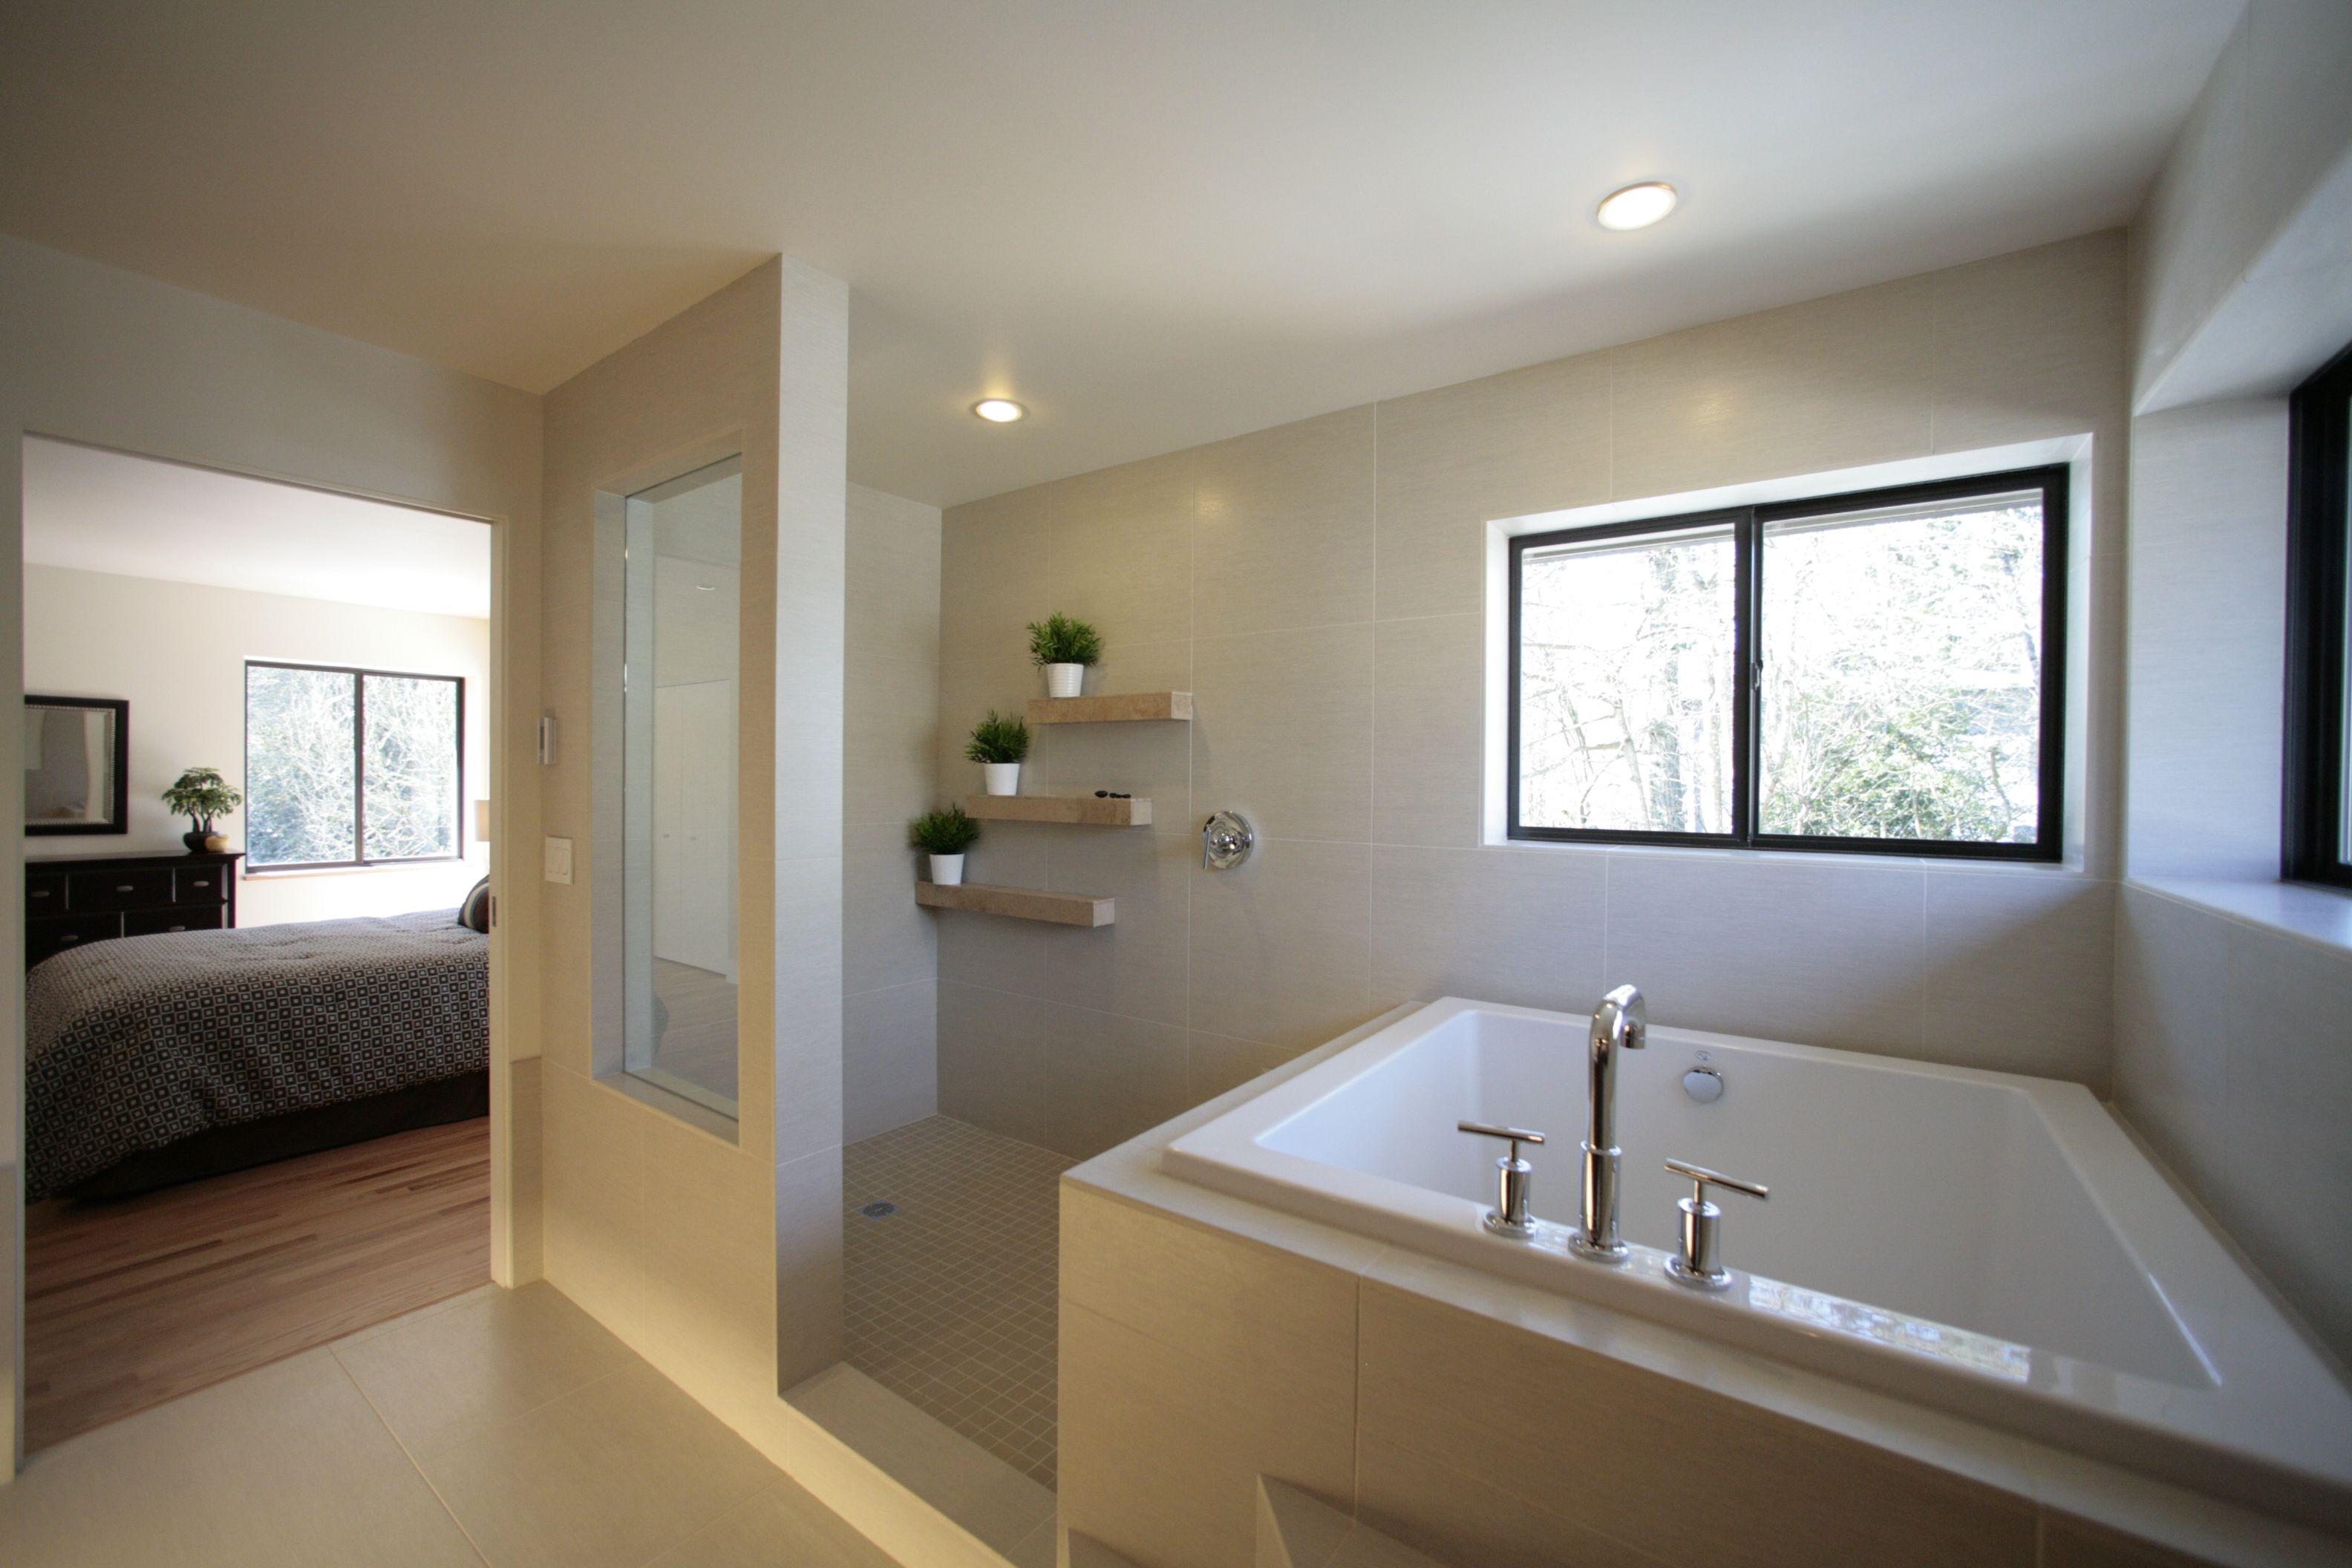 10x12 Bathroom Layout With Corner Windows Bathroom Remodeling